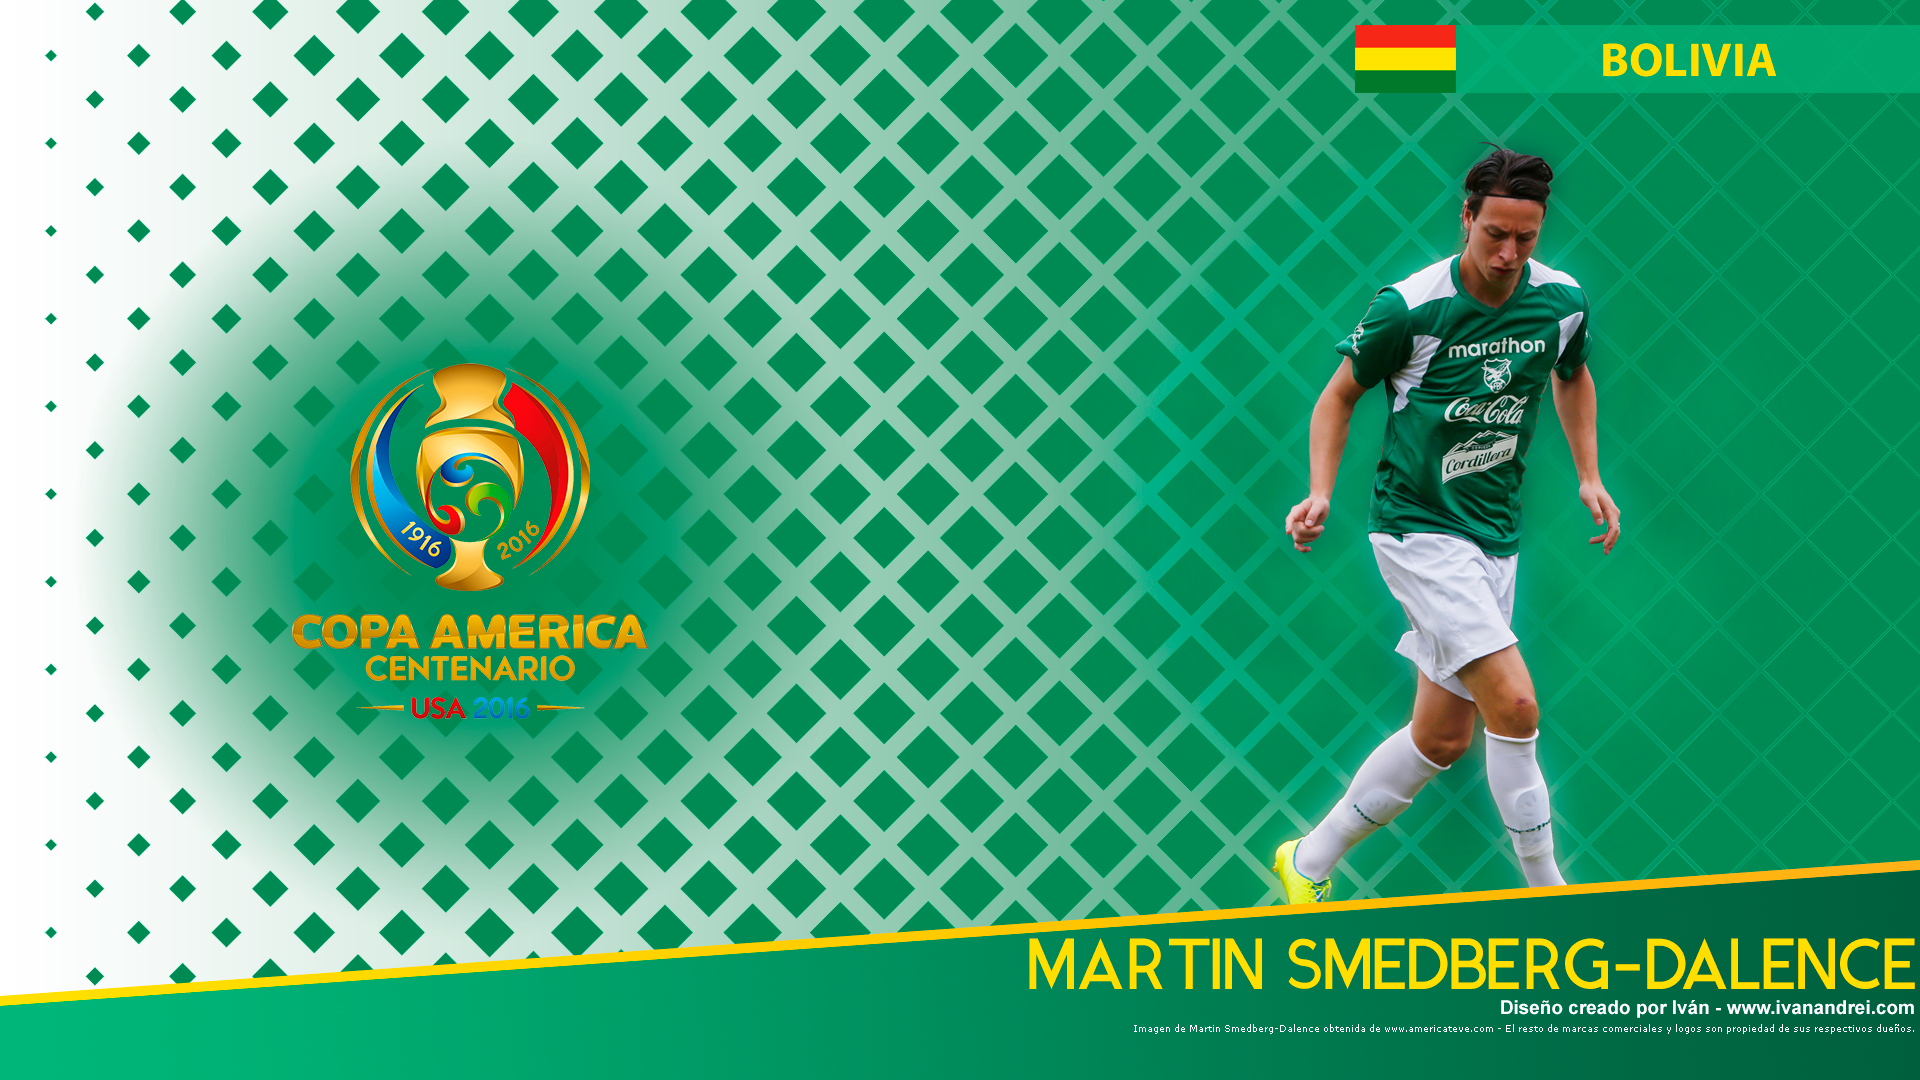 Wallpaper Copa América 2016 – Bolivia (Martin-Smedberg-Dalence)